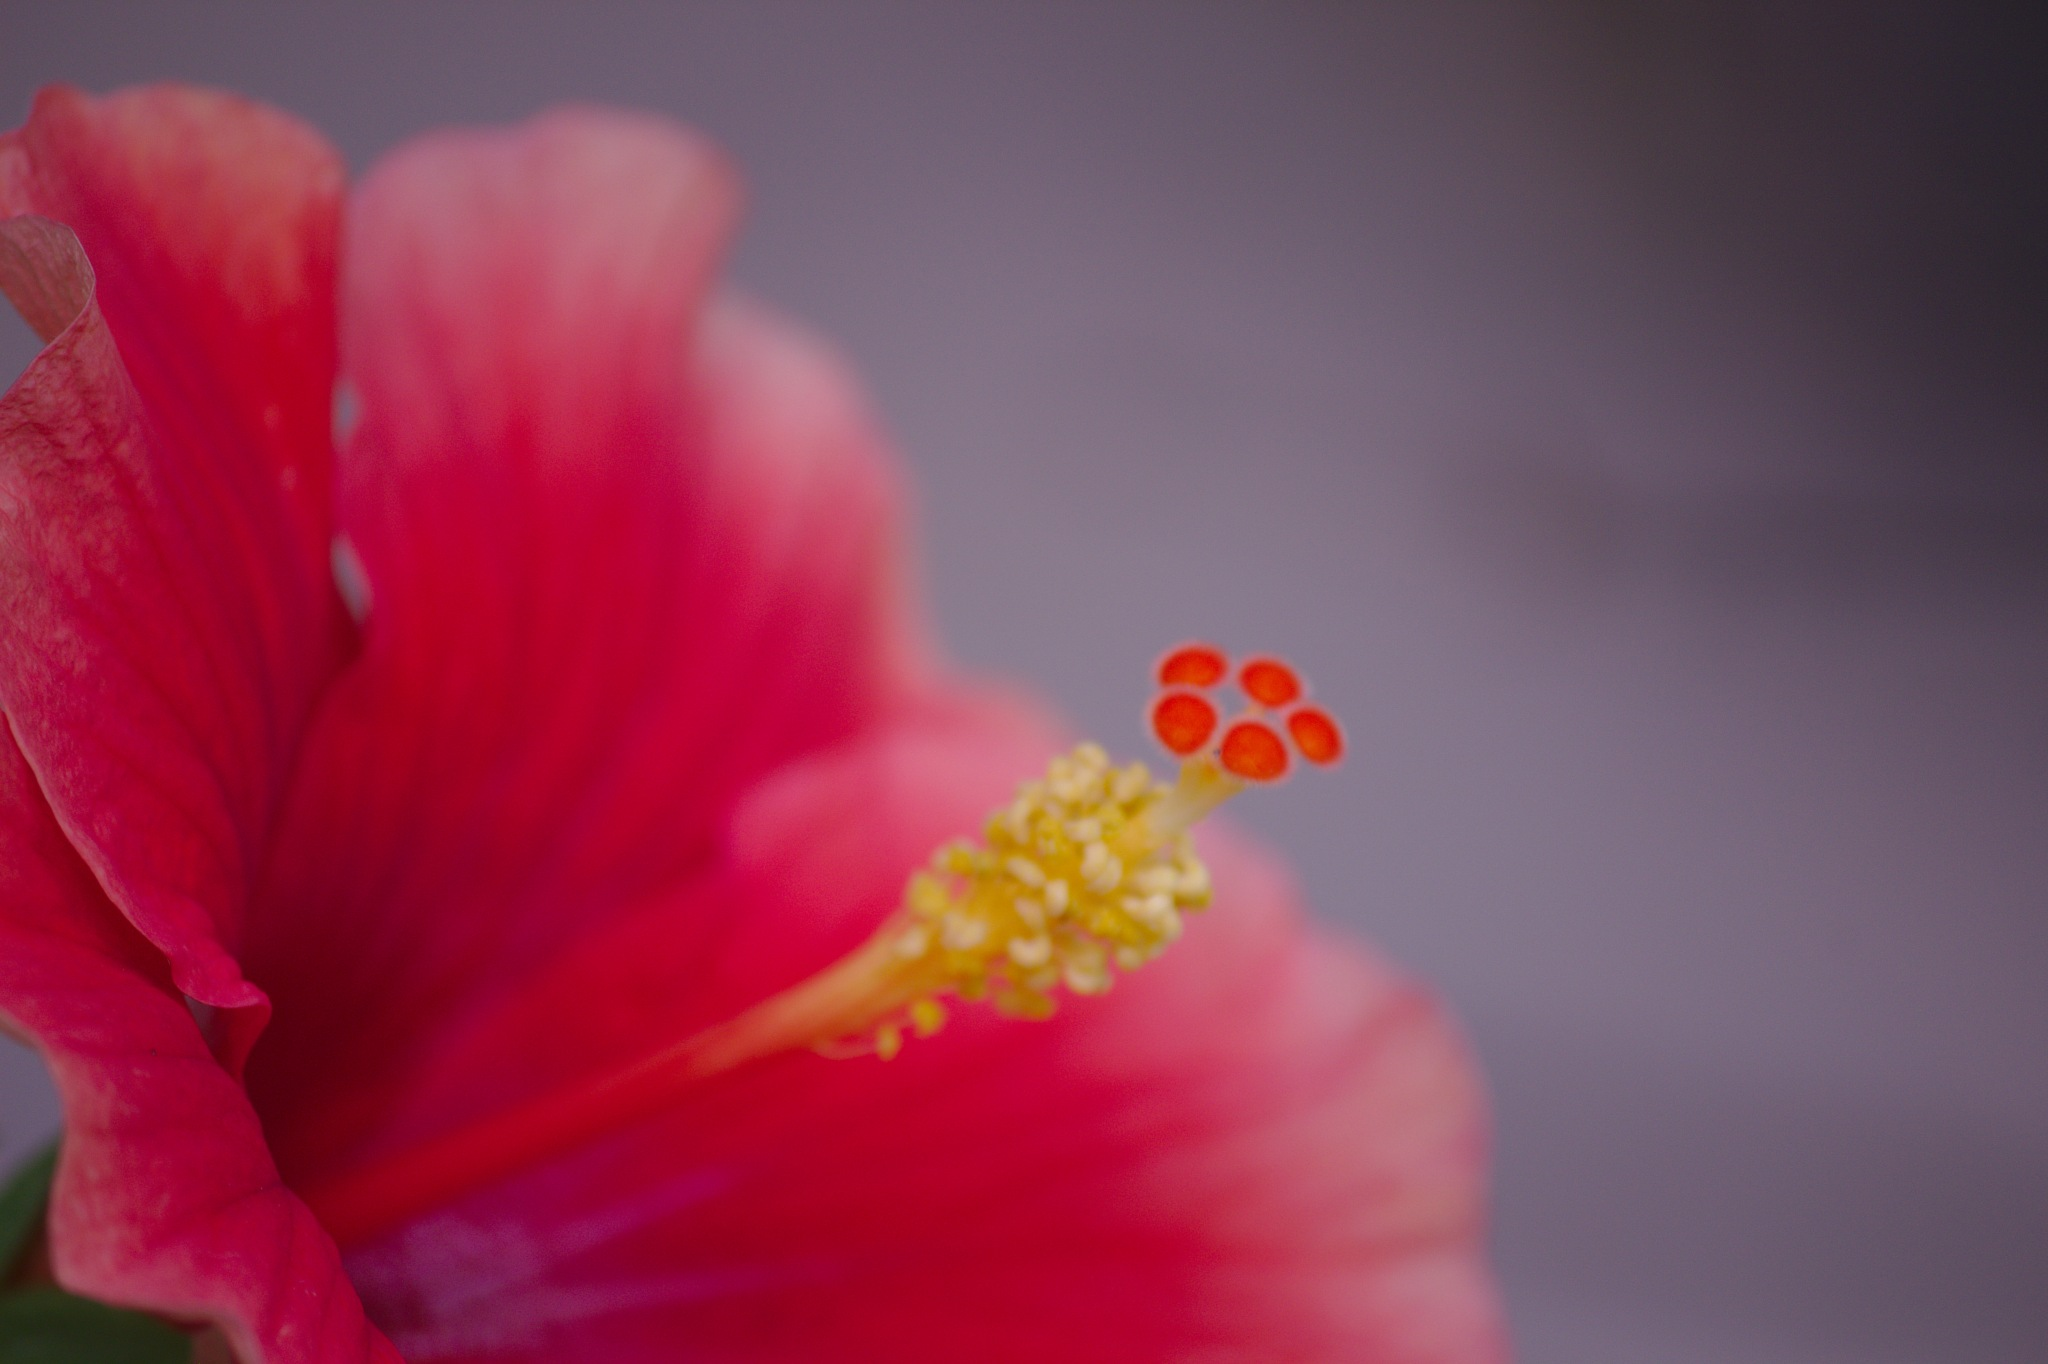 Stigma of a Hibiscus - 5 pods by Guruprasad B. Gopinath